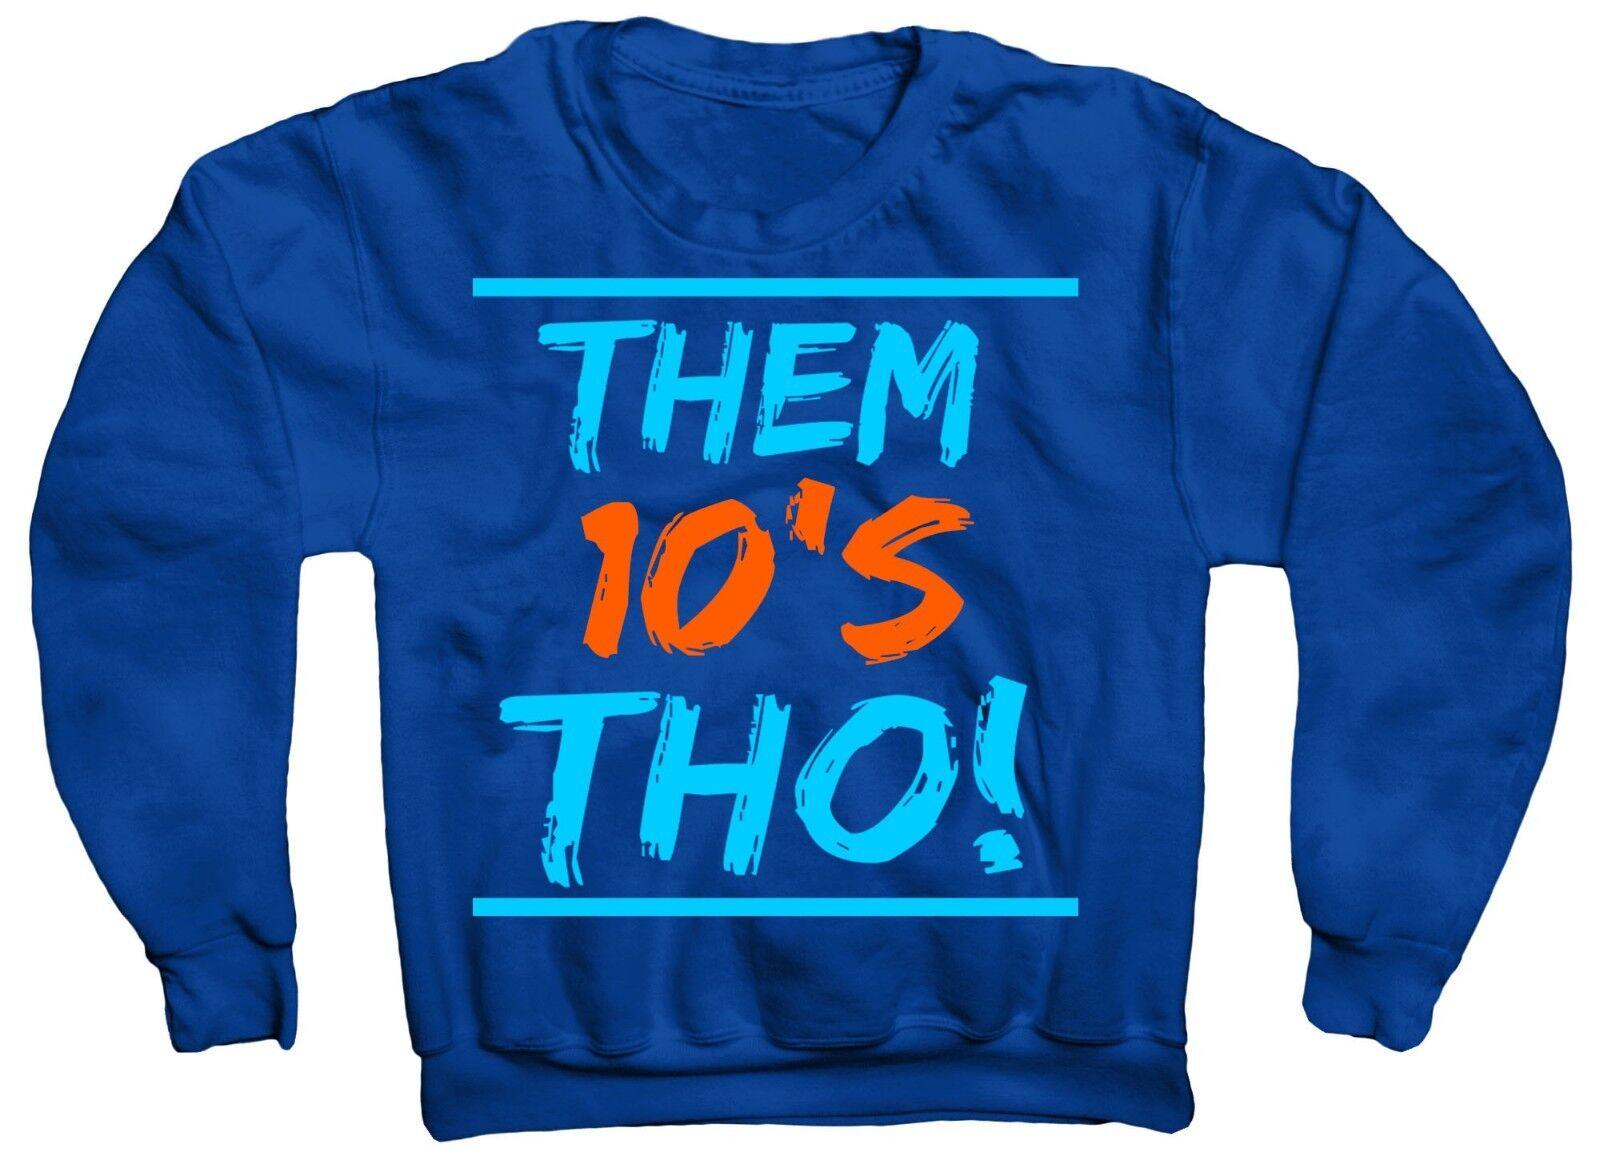 THOS   10 SWEATSHIRT IN JORDANS TINKER  RACER blueE  X HUARACHE LIGHT COLORWAY